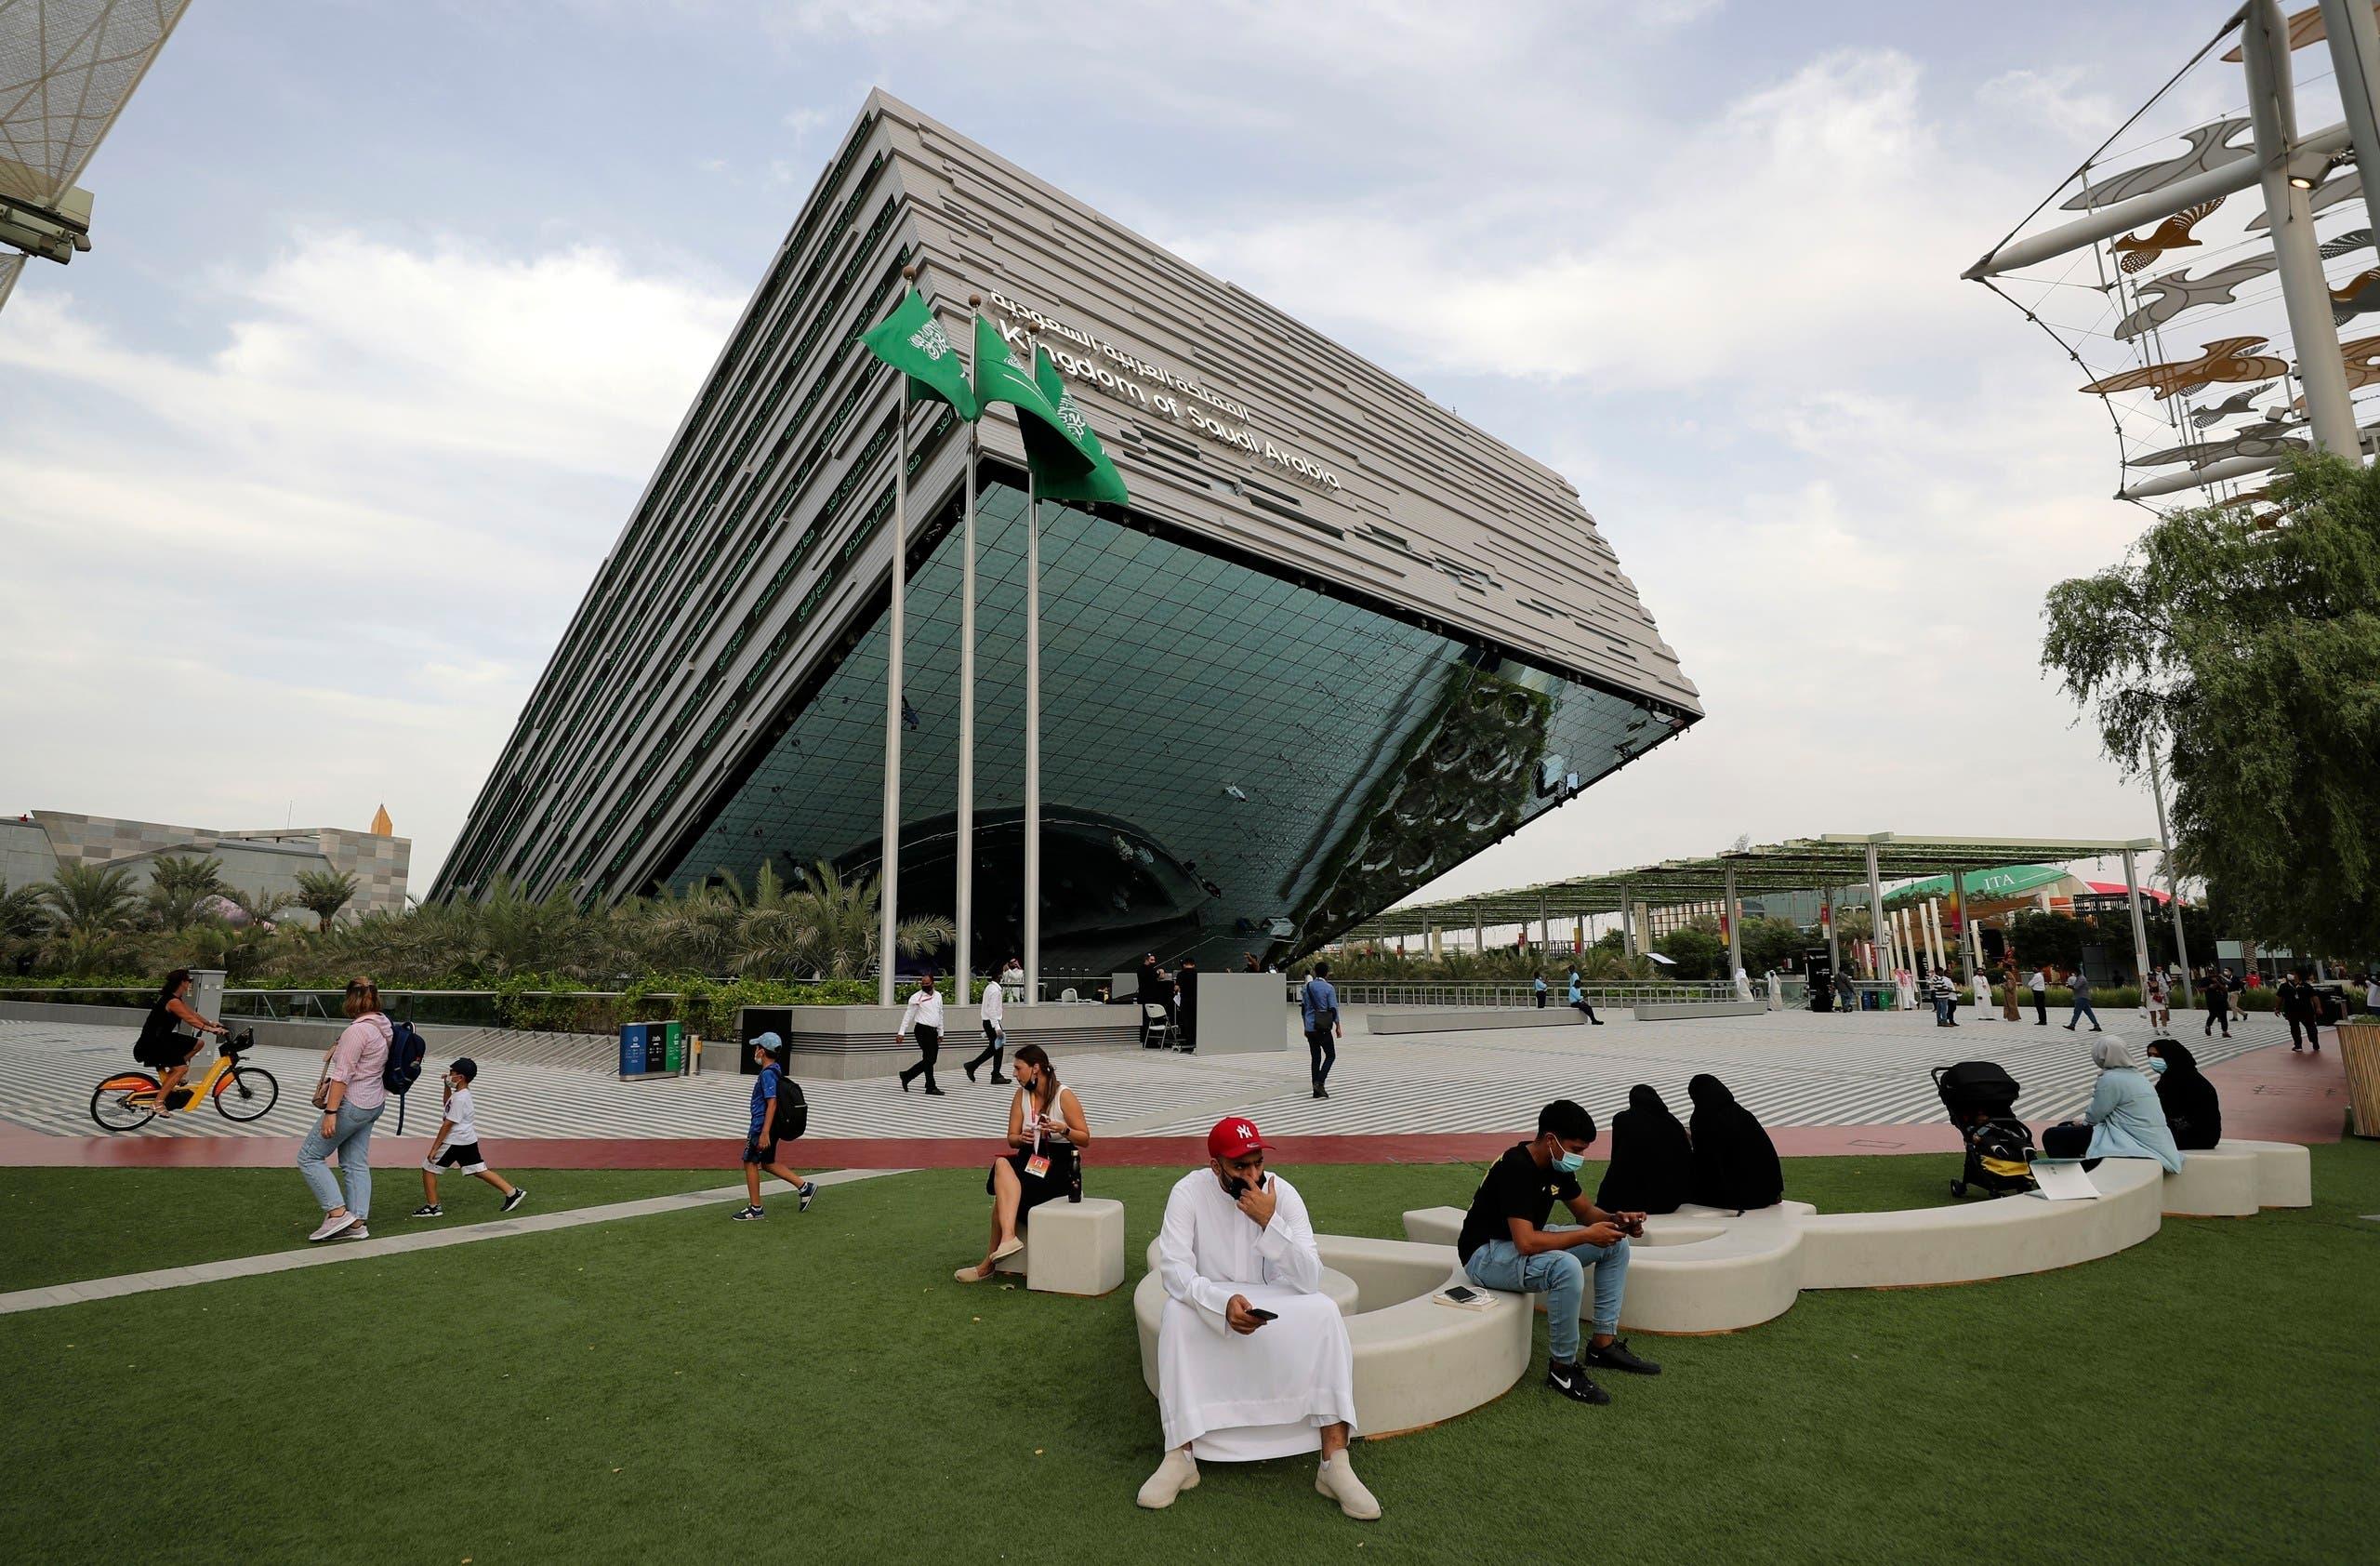 People gather in front of the Saudi pavilion at the Dubai Expo 2020, in Dubai, United Arab Emirates, Sunday, Oct. 3, 2021. (File photo: AP)